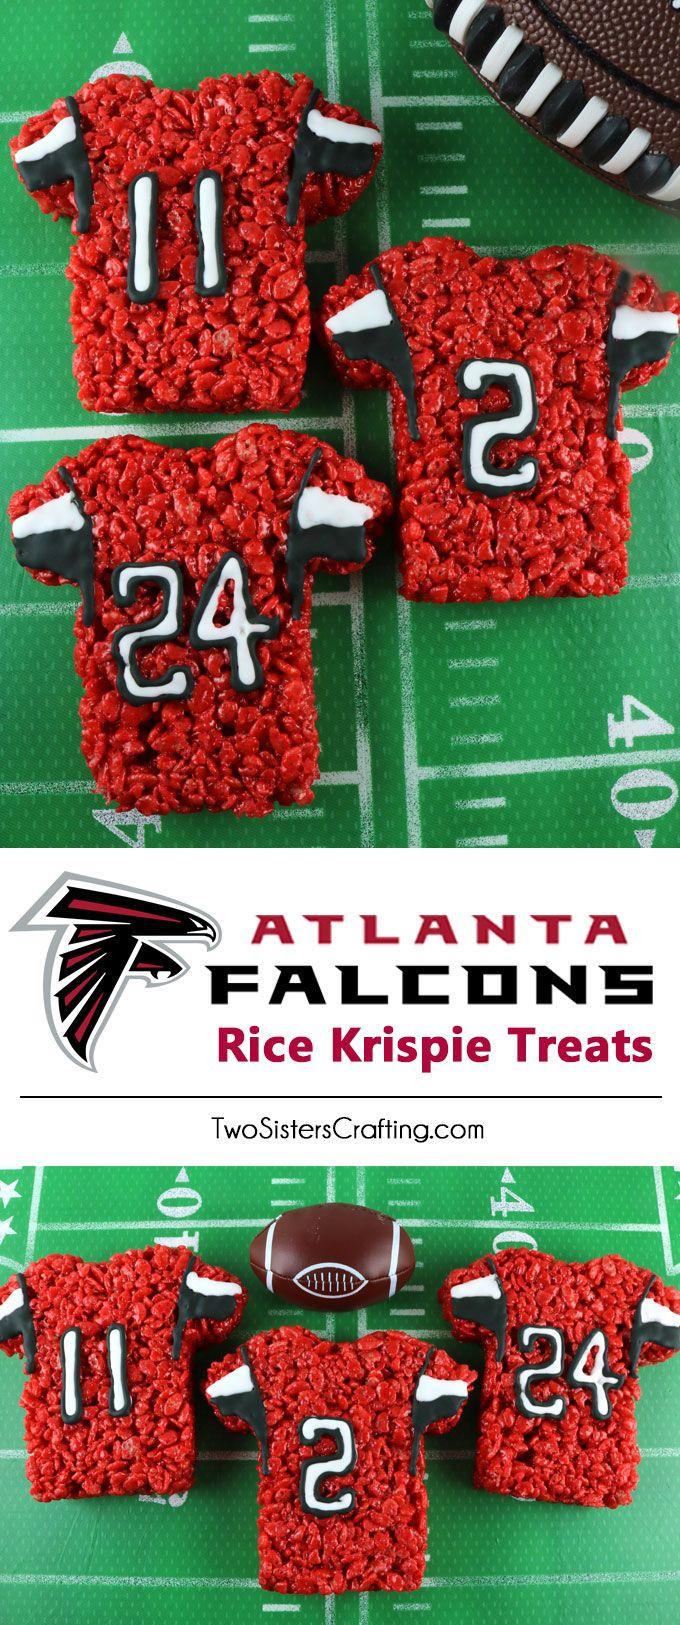 Atlanta Falcons Rice Krispie Treats Superbowl Desserts Rice Krispie Treats Bowl Party Food